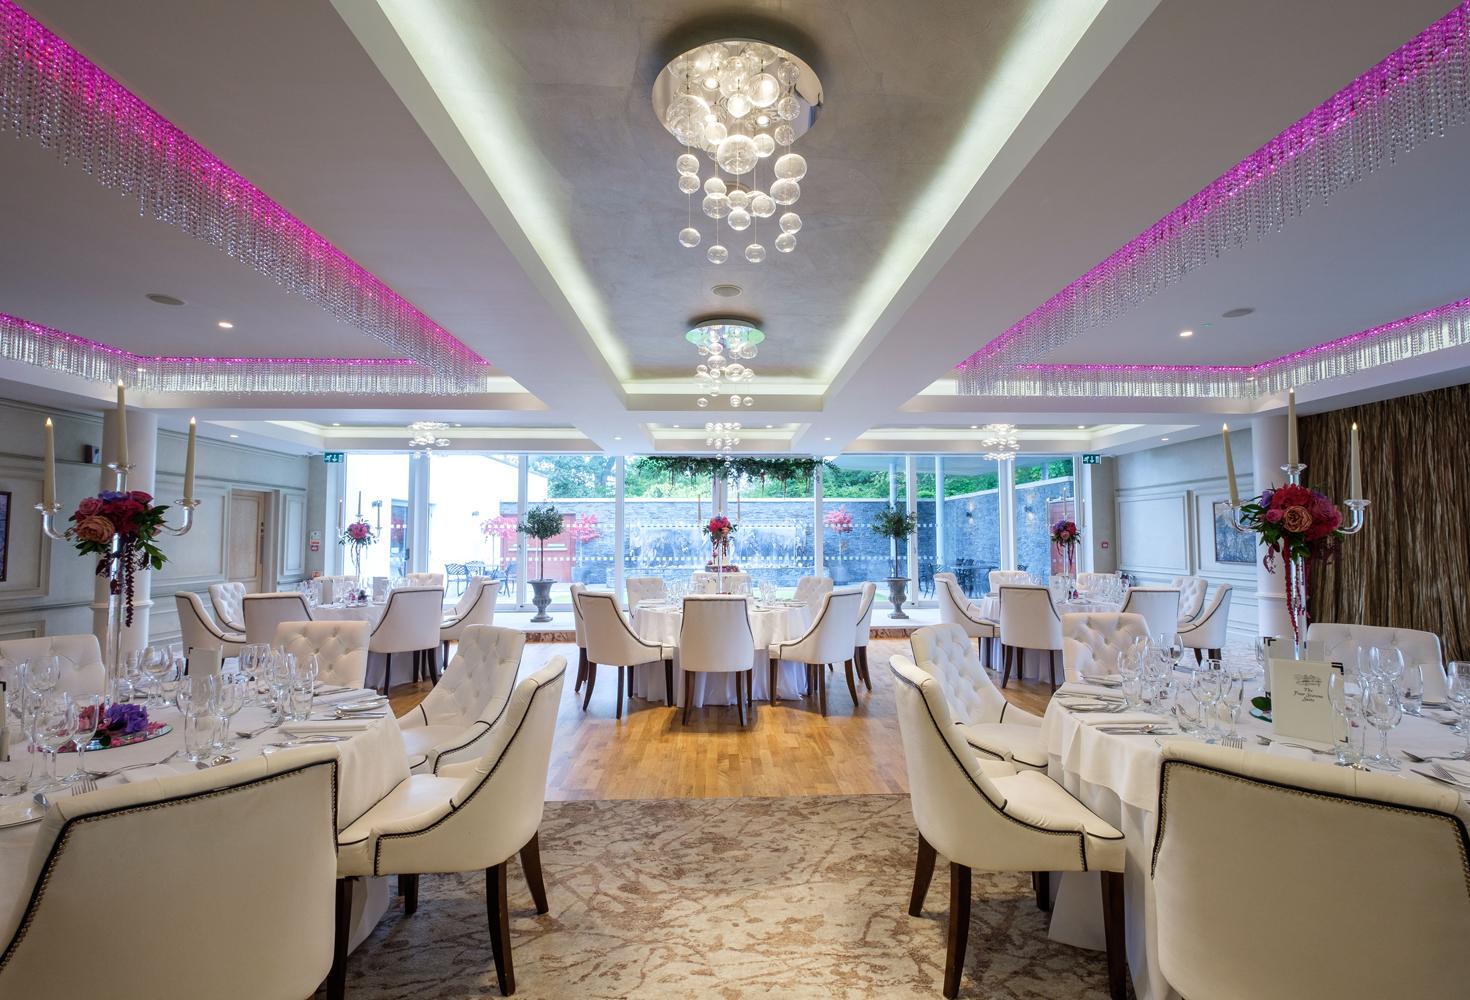 Galgorm-resort-hotel-wedding-venue-ireland-2.jpg